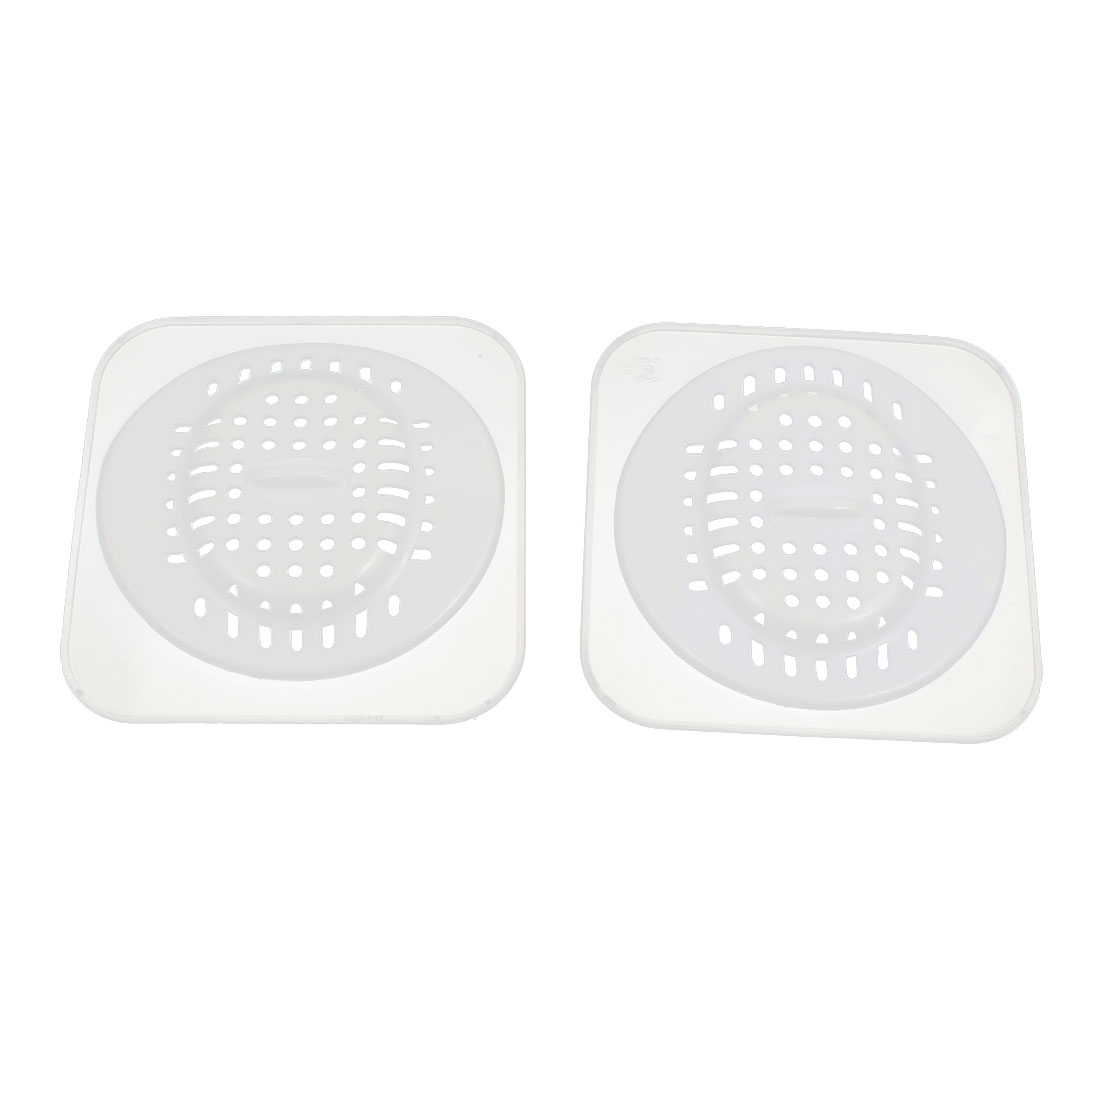 Bathroom Kitchen Bath Basin Sink Silicone Mesh Hair Catcher Stopper Floor Drain 2 PCS